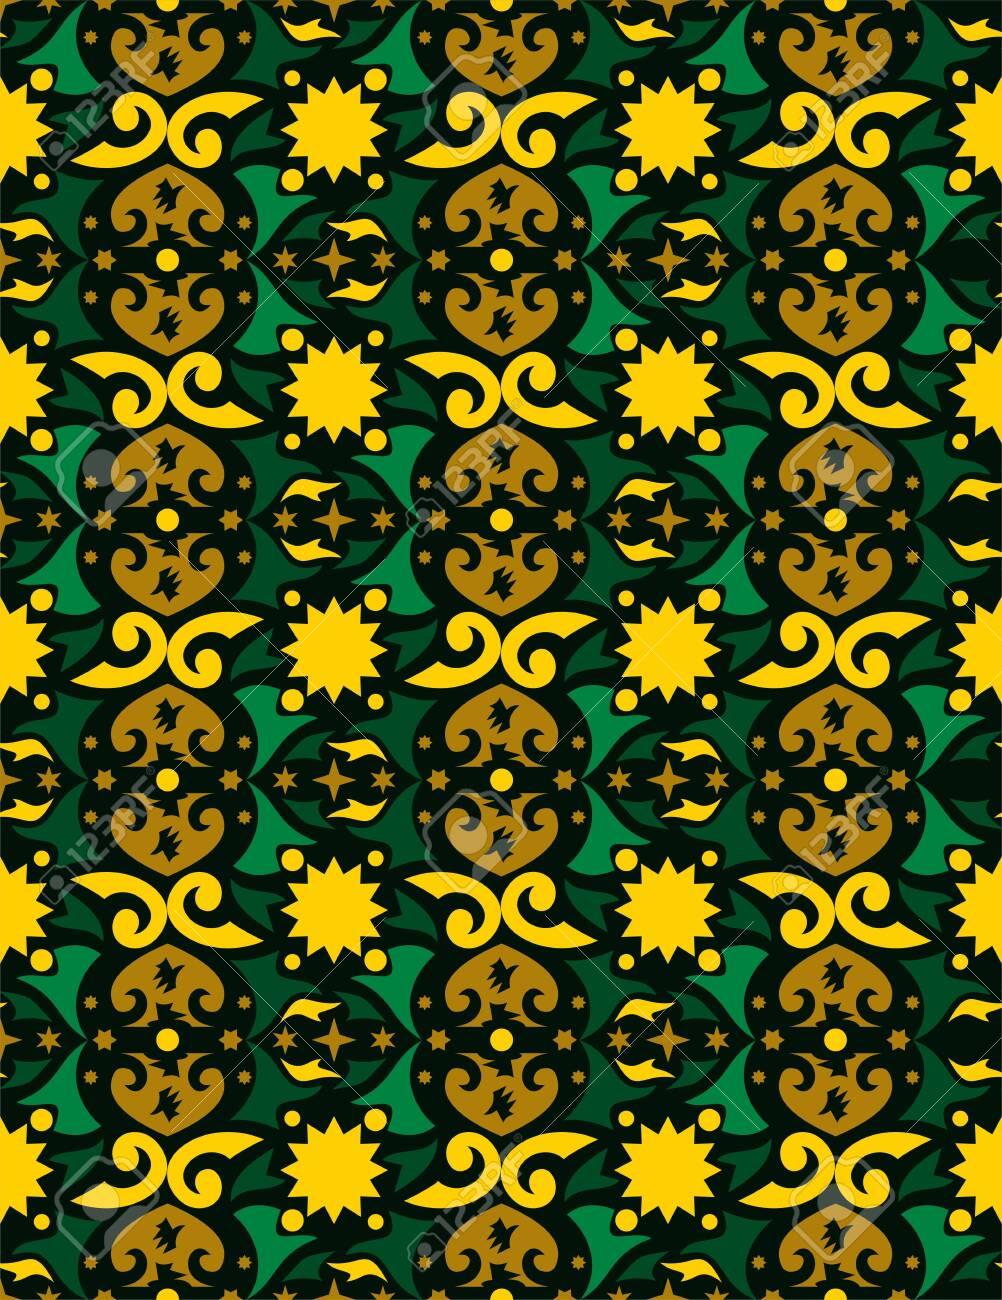 Background Motif Dayak : background, motif, dayak, Seamless, Pattern, Borneo, Batik, Style., Traditional, Indonesian.., Royalty, Cliparts,, Vectors,, Stock, Illustration., Image, 130661705.